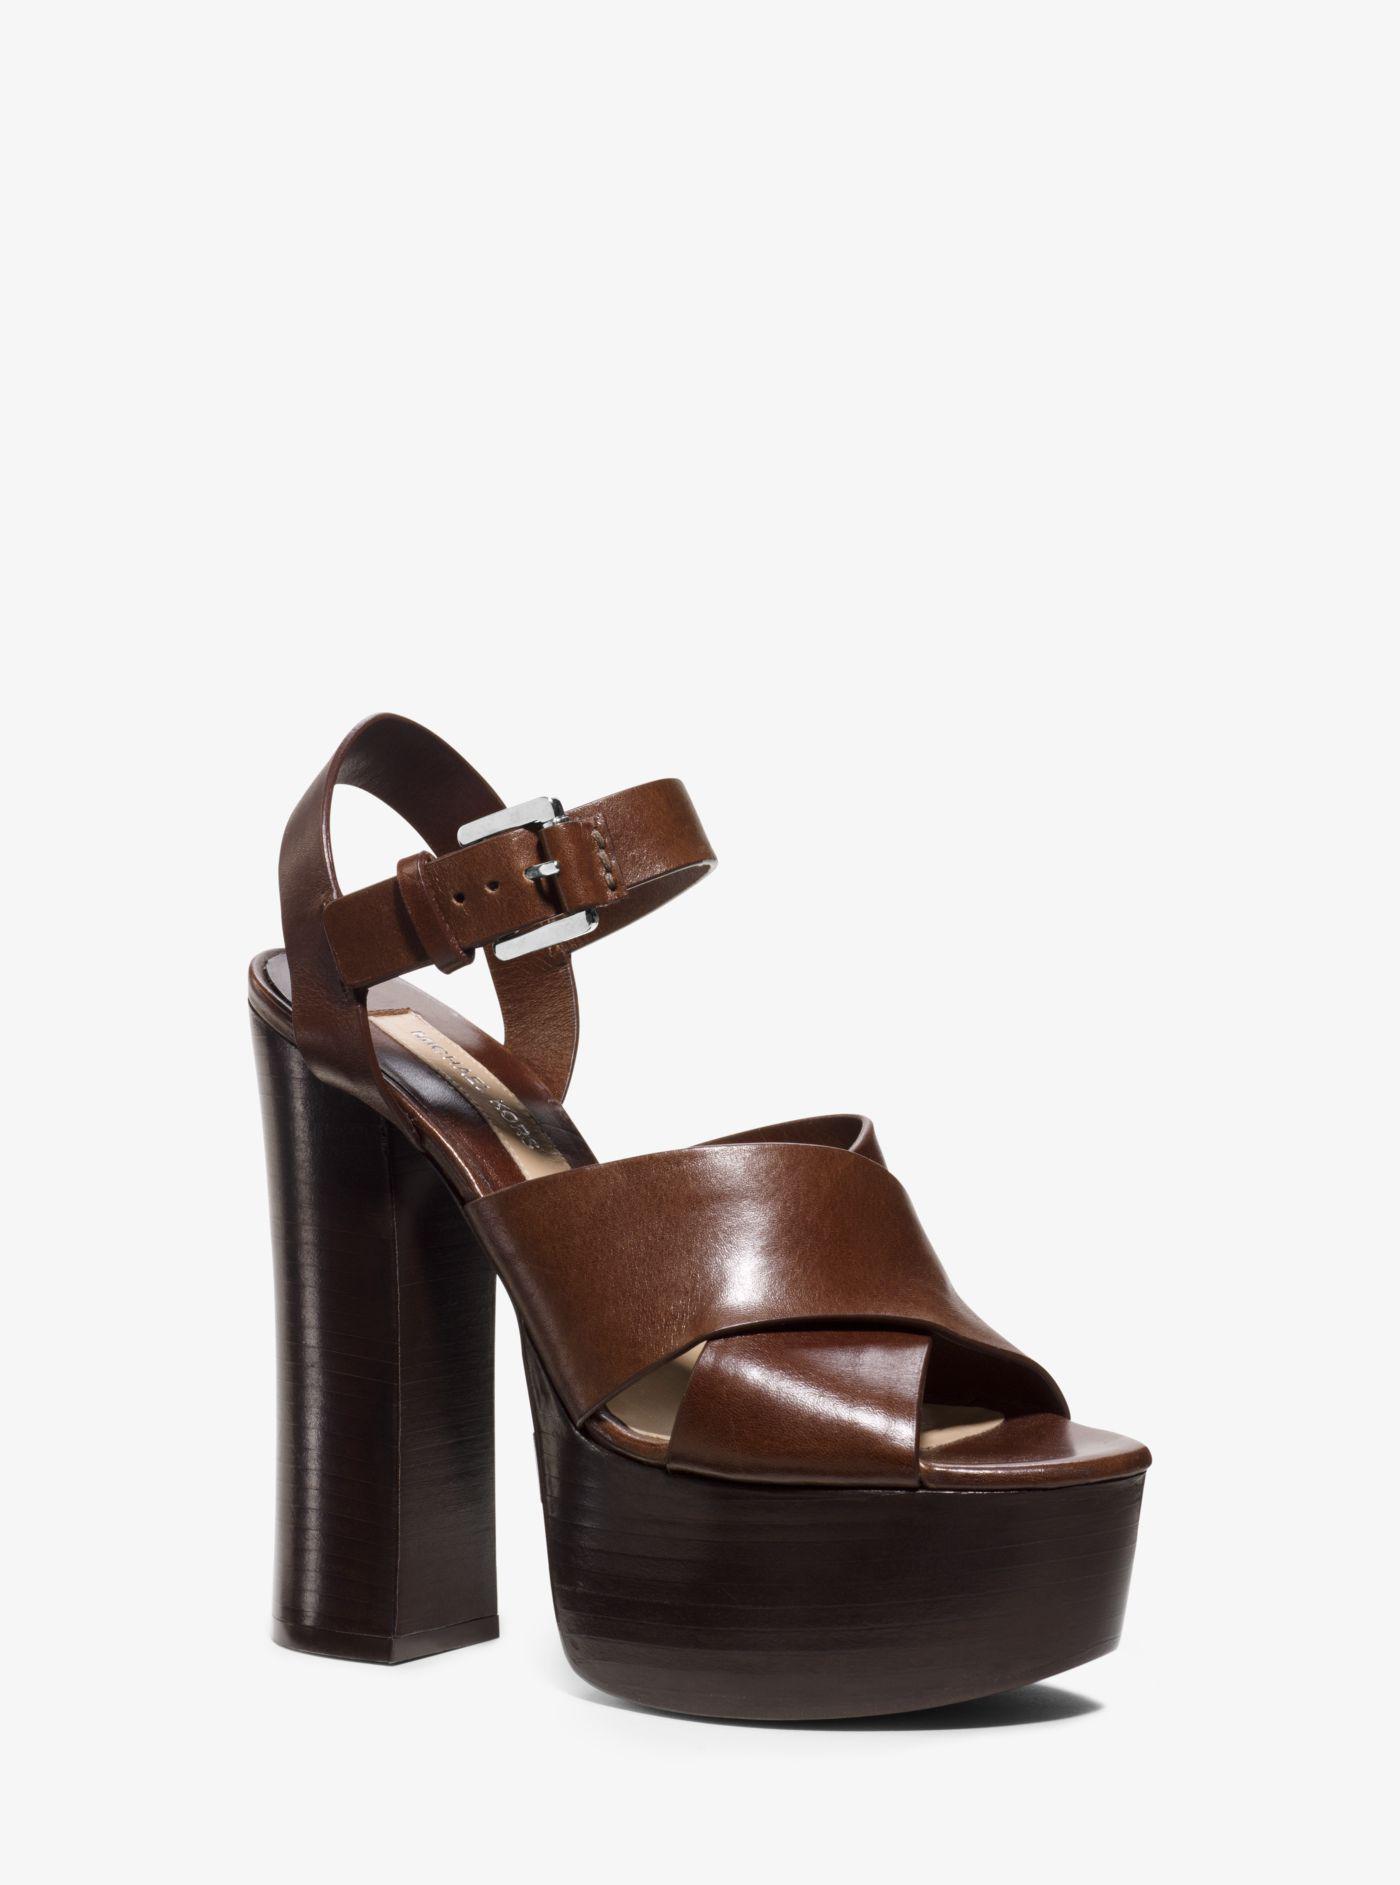 5a6e1a51d2 Michael Kors Crista Calf Leather Platform Sandal in Brown - Lyst